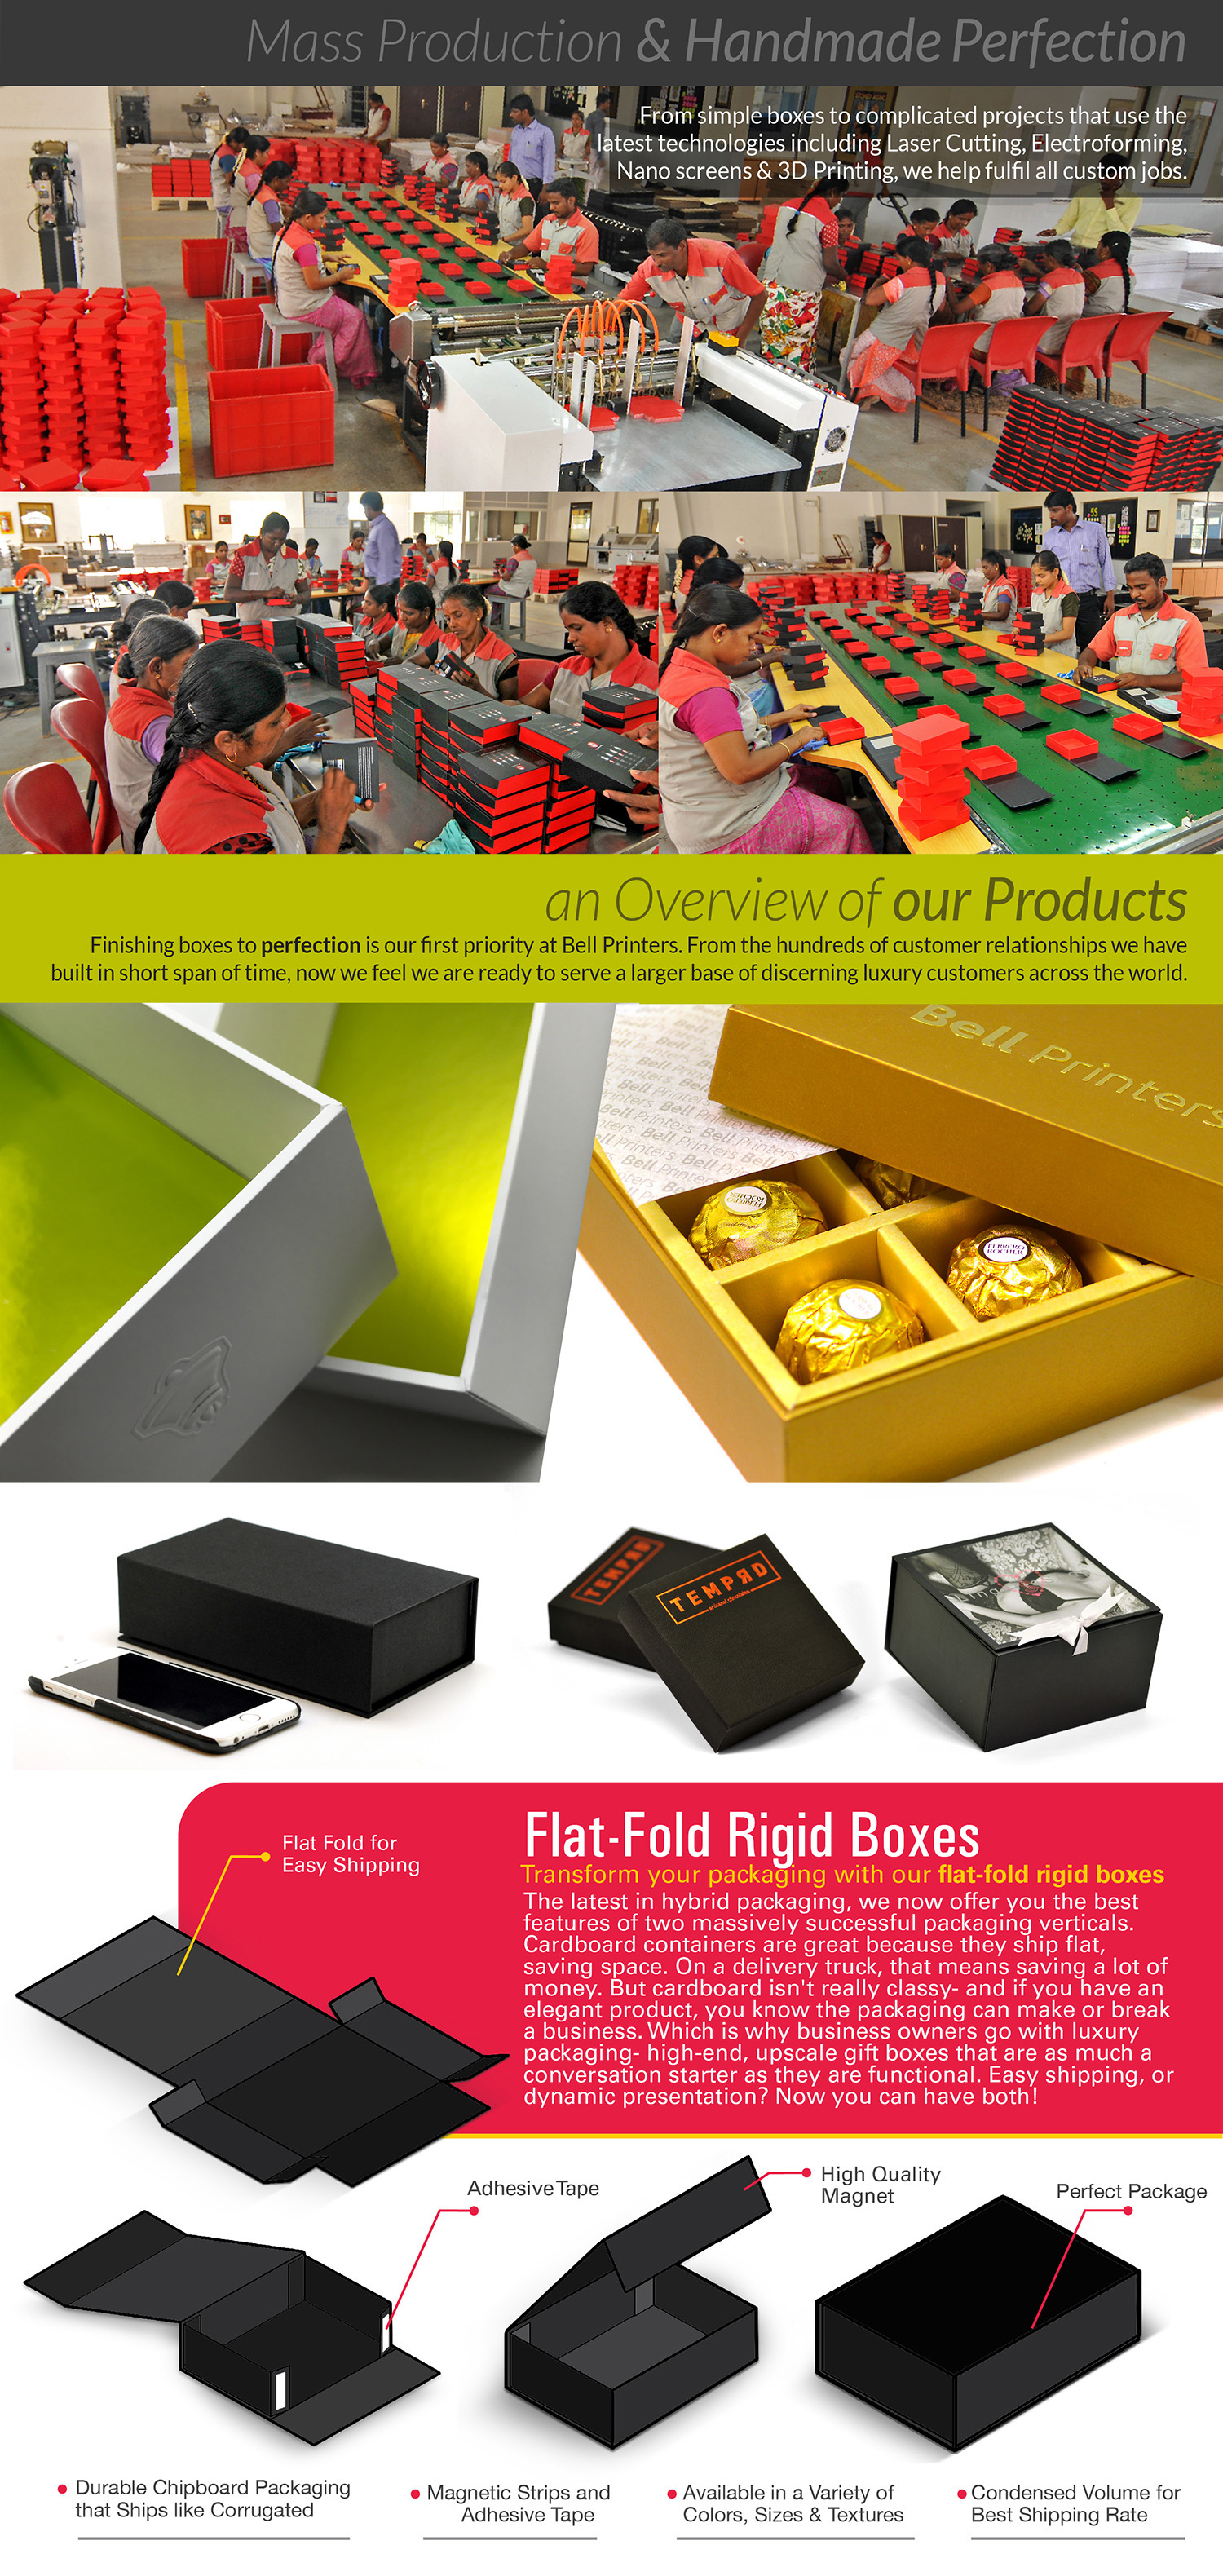 Rigid box production